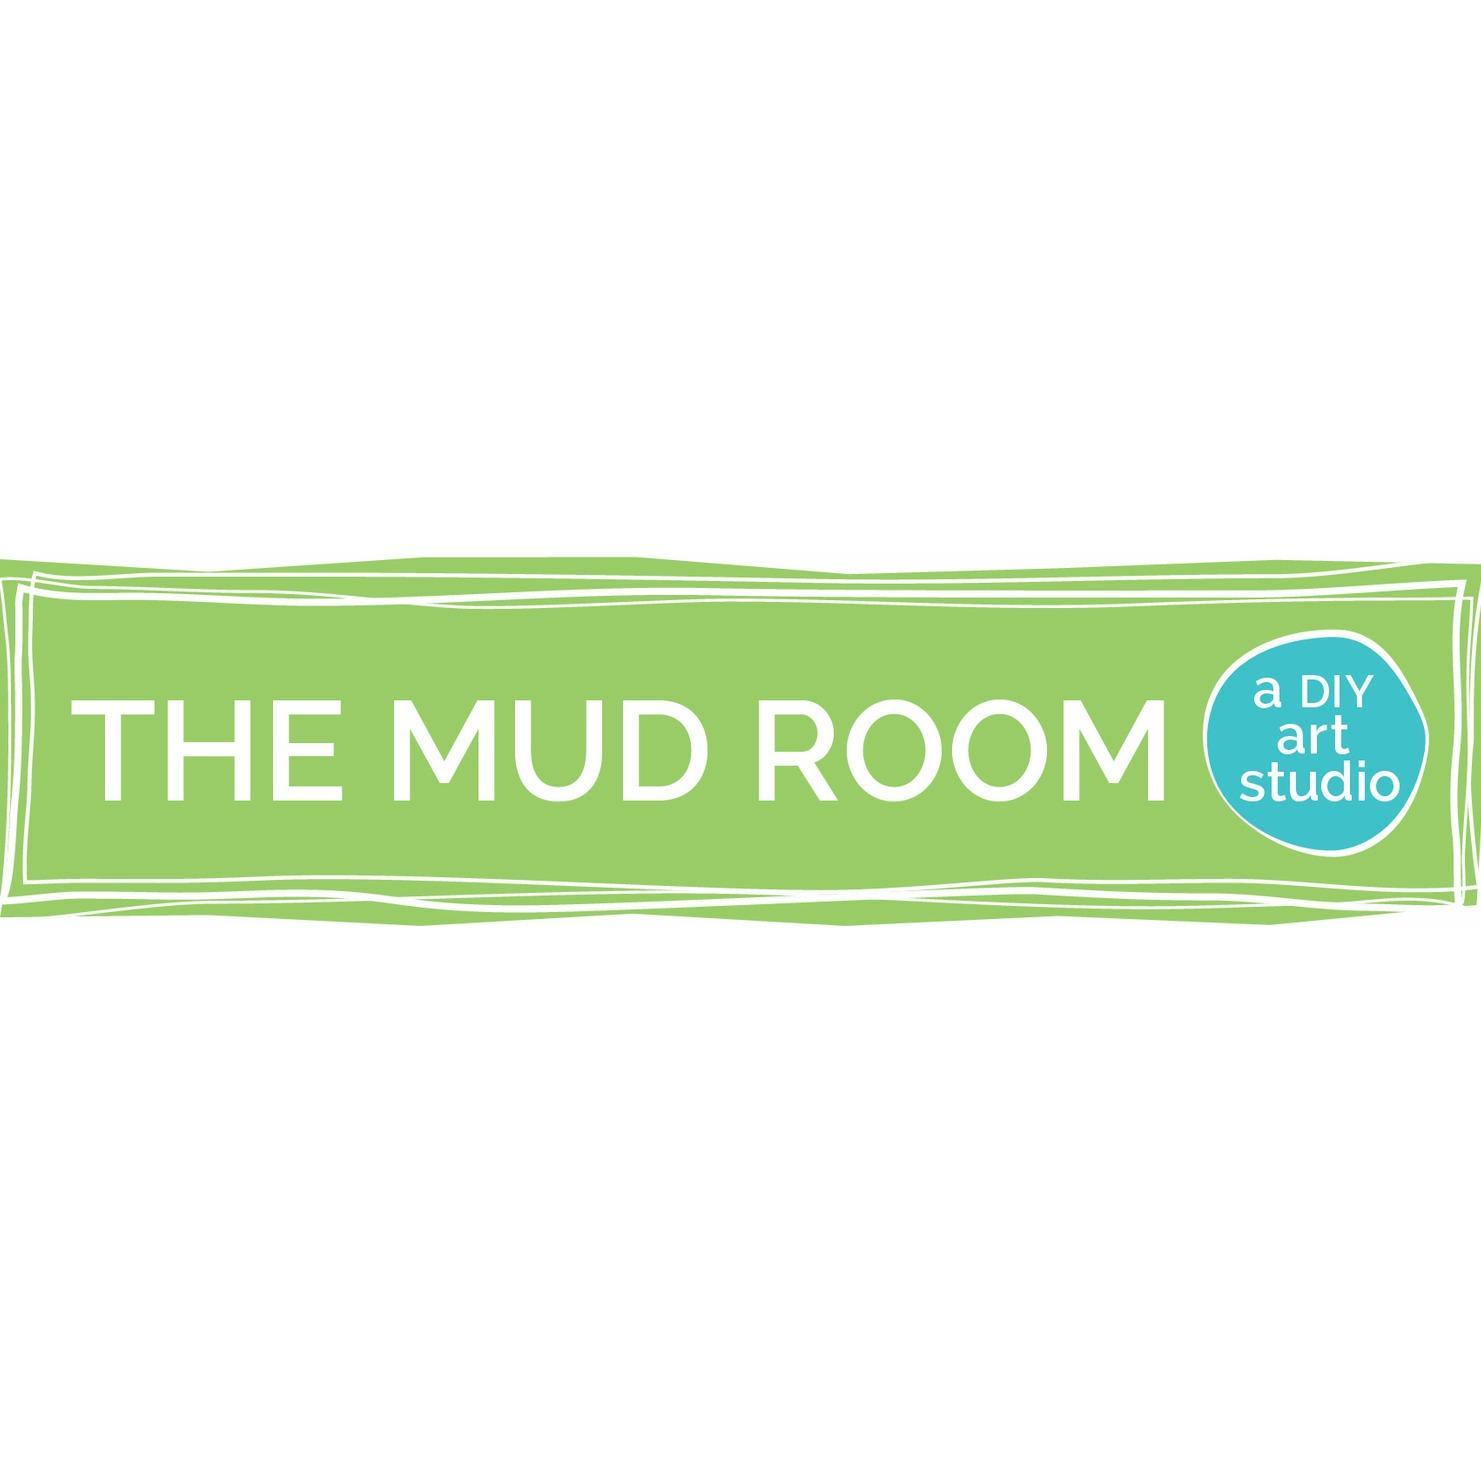 The Mud Room - Grand Rapids, MI 49525 - (616)259-7269 | ShowMeLocal.com